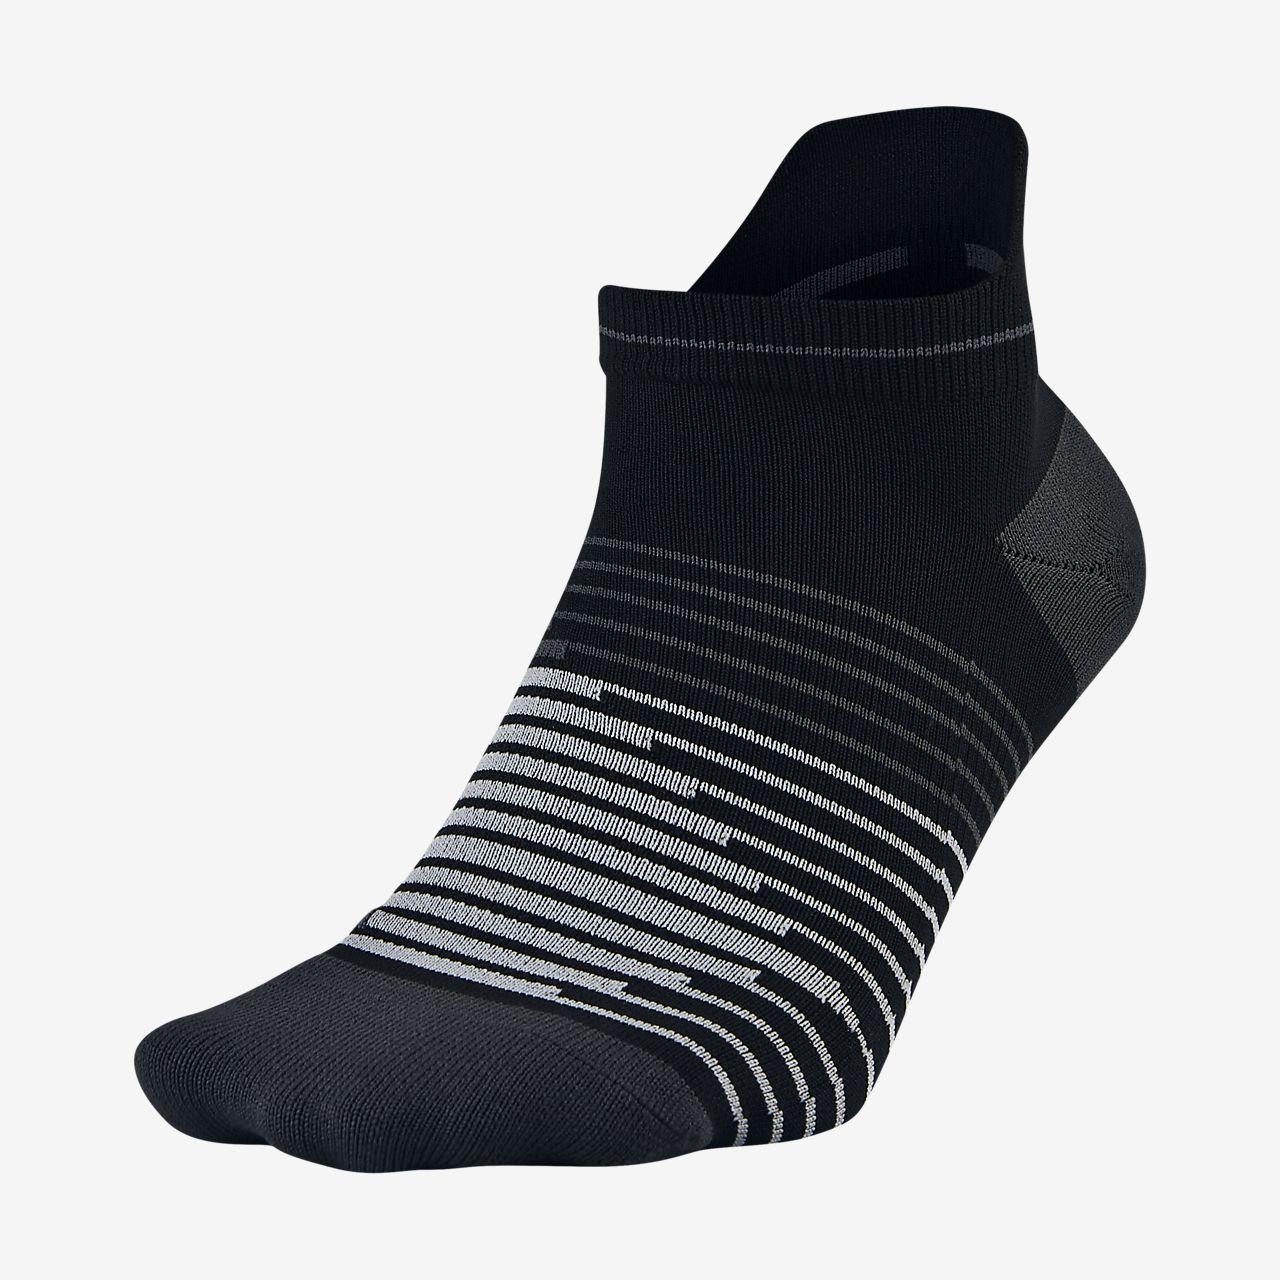 nike dri fit lightweight no show tab running socks nike. Black Bedroom Furniture Sets. Home Design Ideas